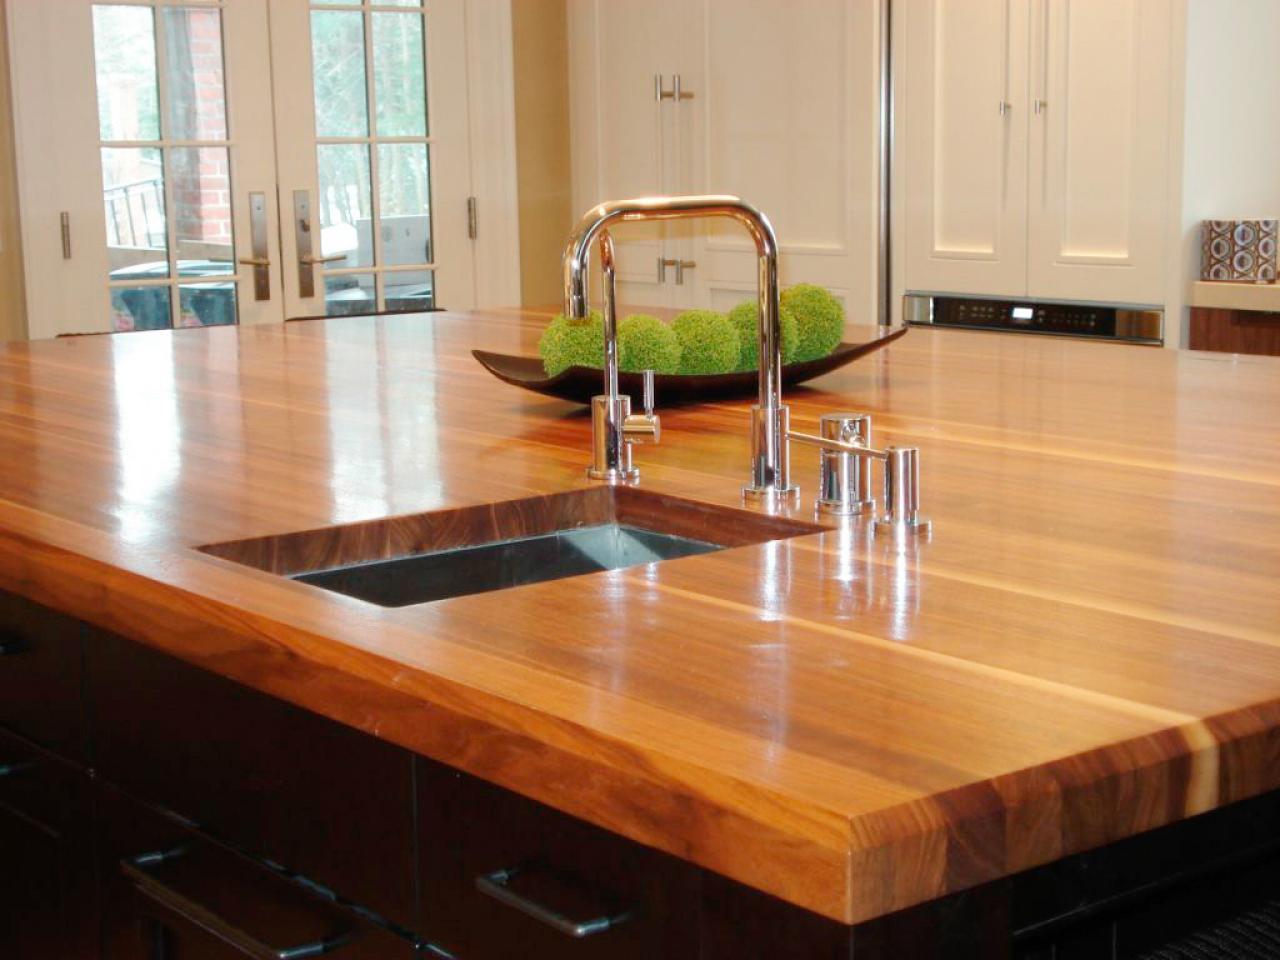 Resurfacing-Kitchen-Countertops_s4x3